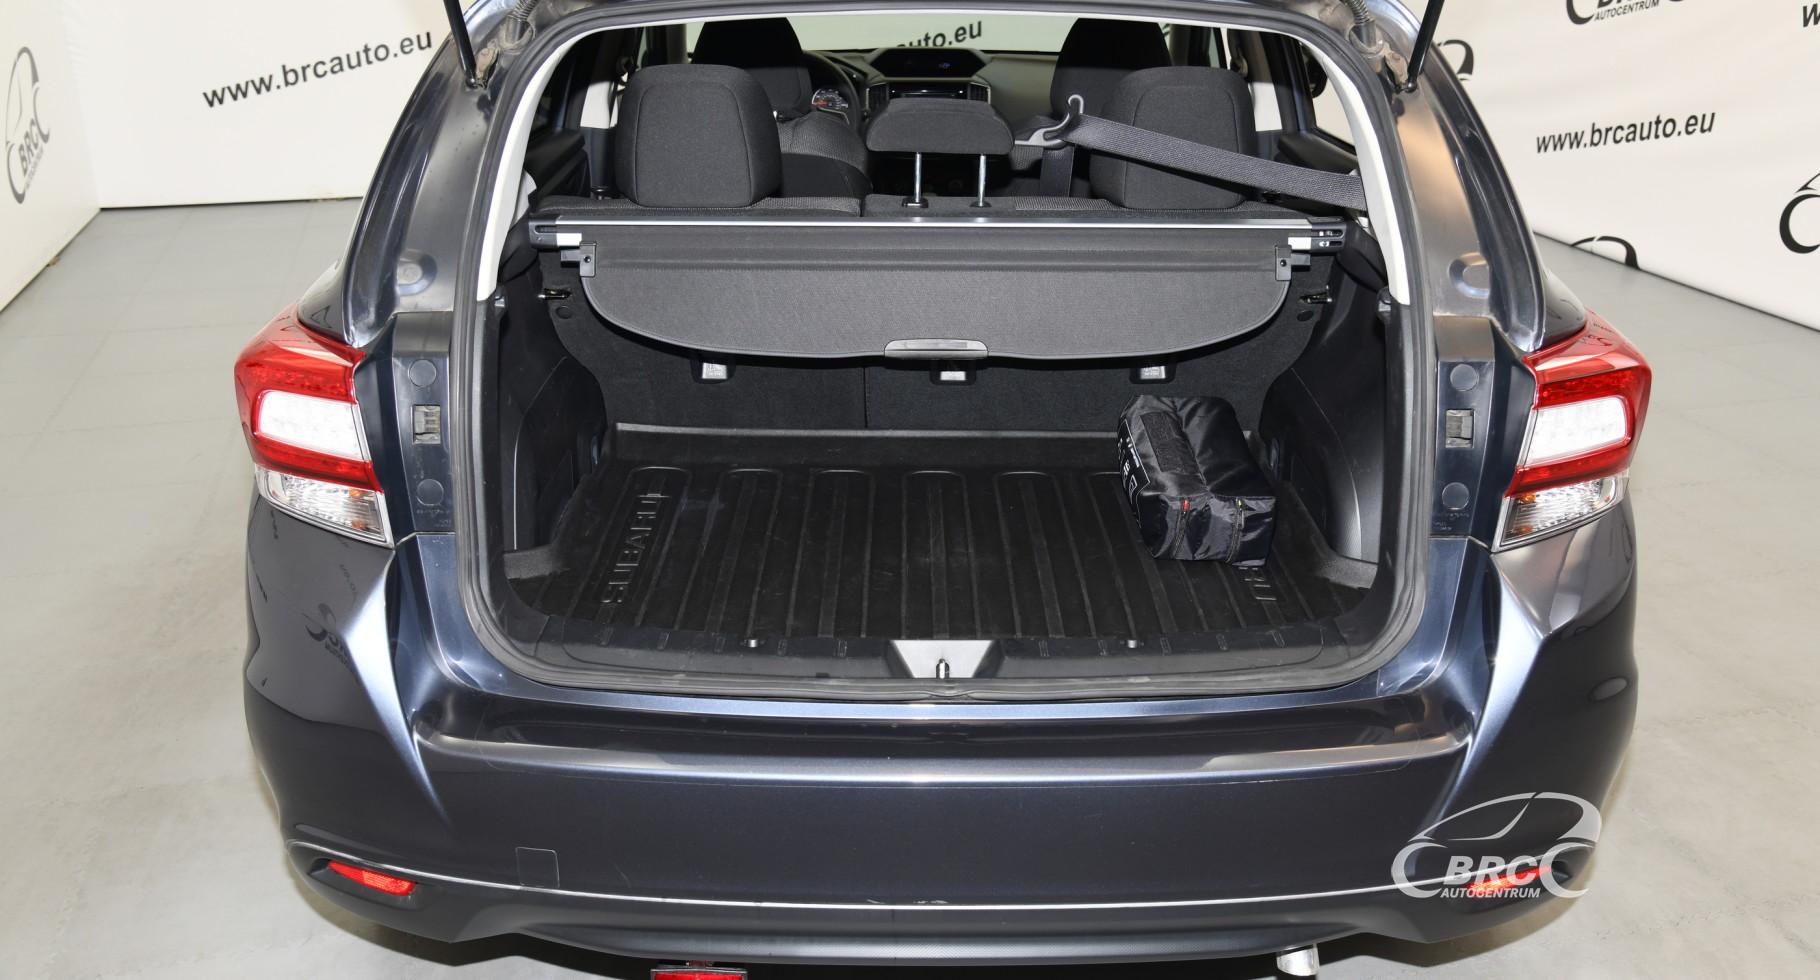 Subaru Impreza 2.0i PZE AWD Automatas